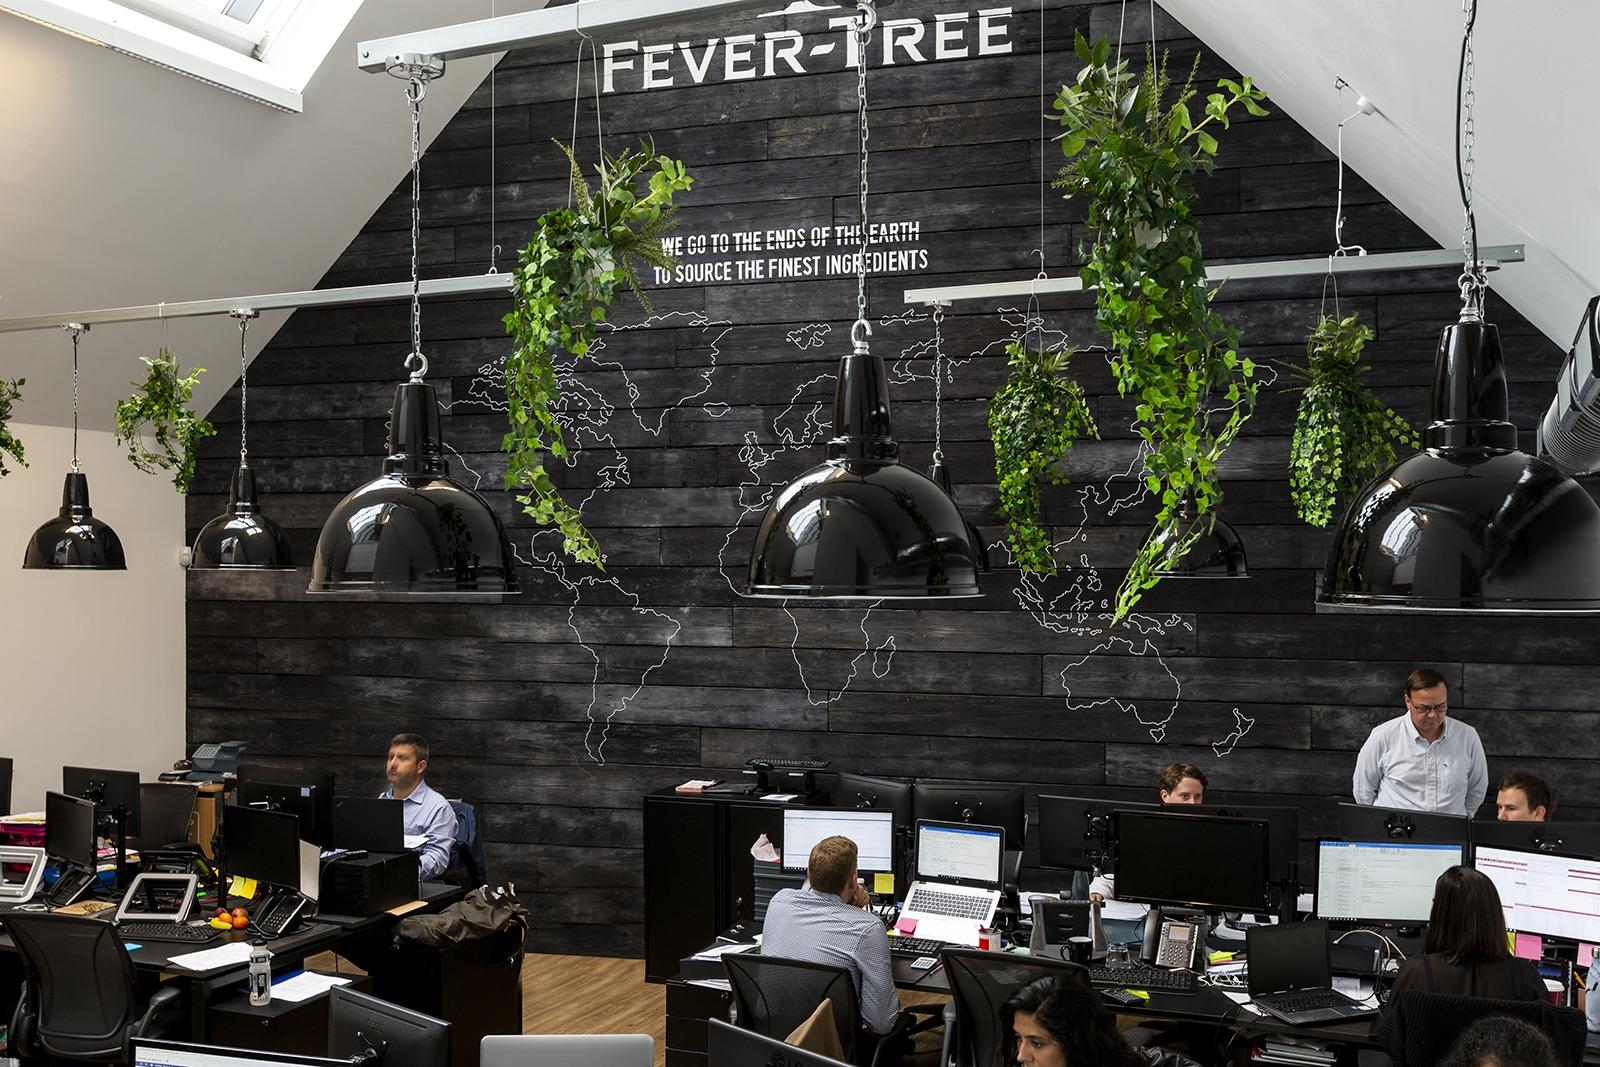 fevertree-office-london-12